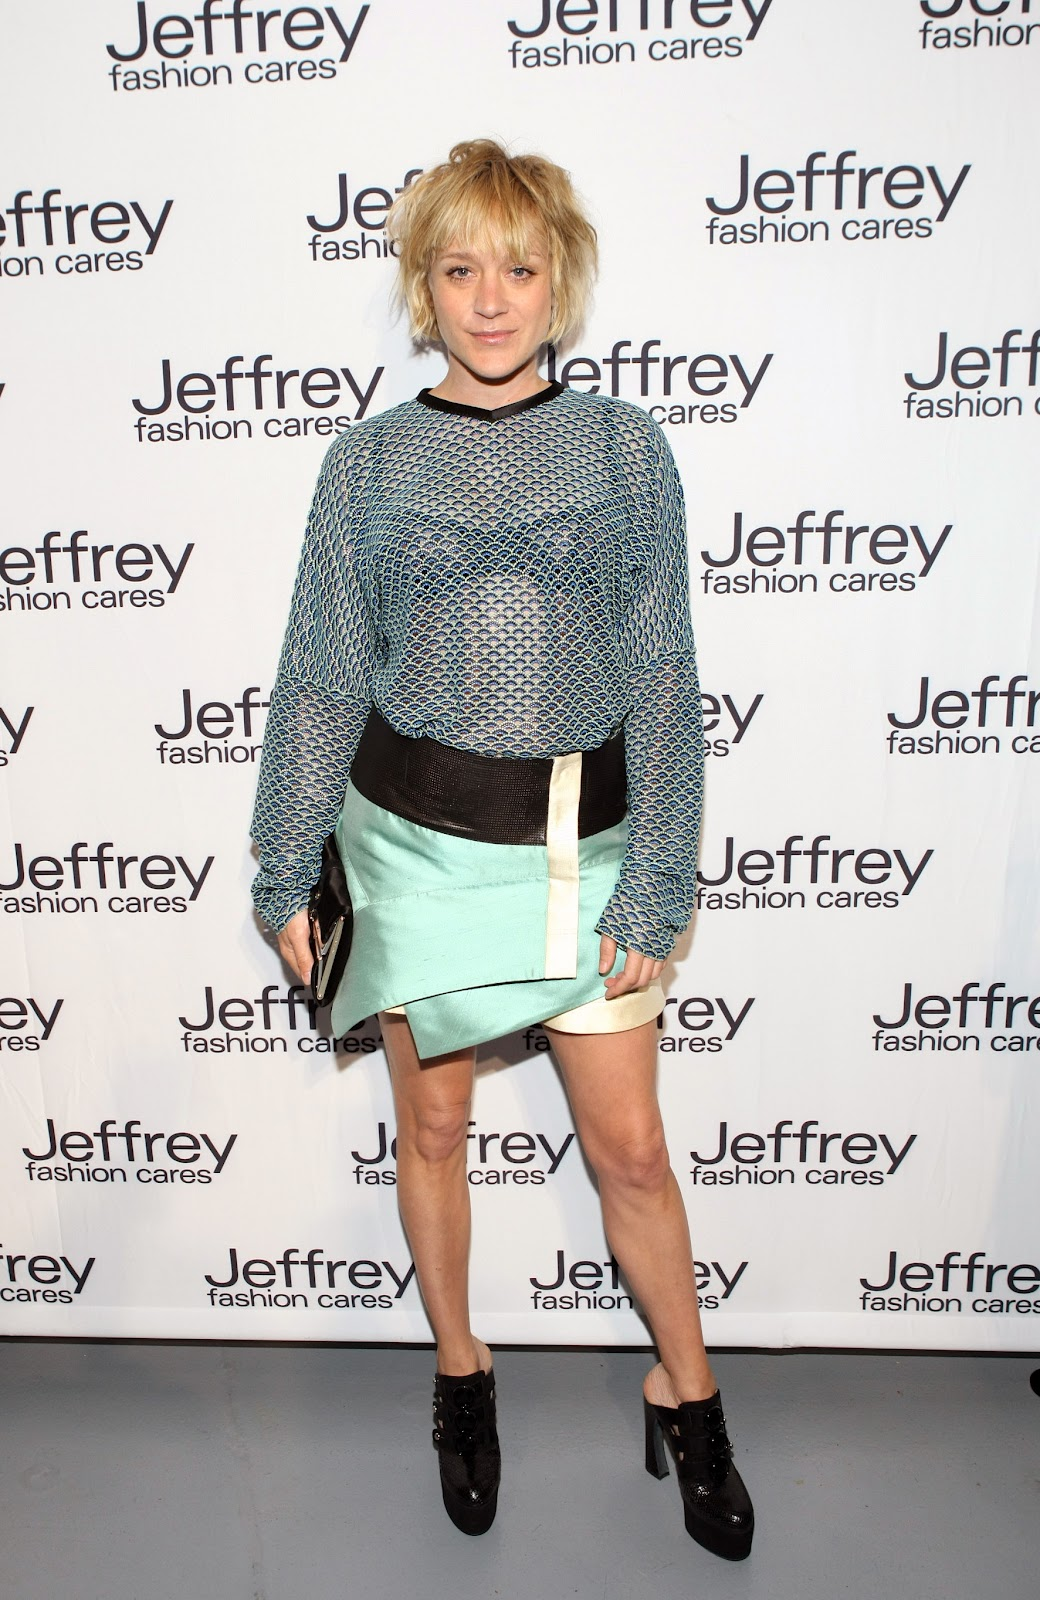 http://2.bp.blogspot.com/-3Z4PjBUKYBc/T3hwO_sQ7yI/AAAAAAAAAHo/JZek6xKRqNM/s1600/ChloeSevigny_jeffrey_fashion_cares_017.jpg